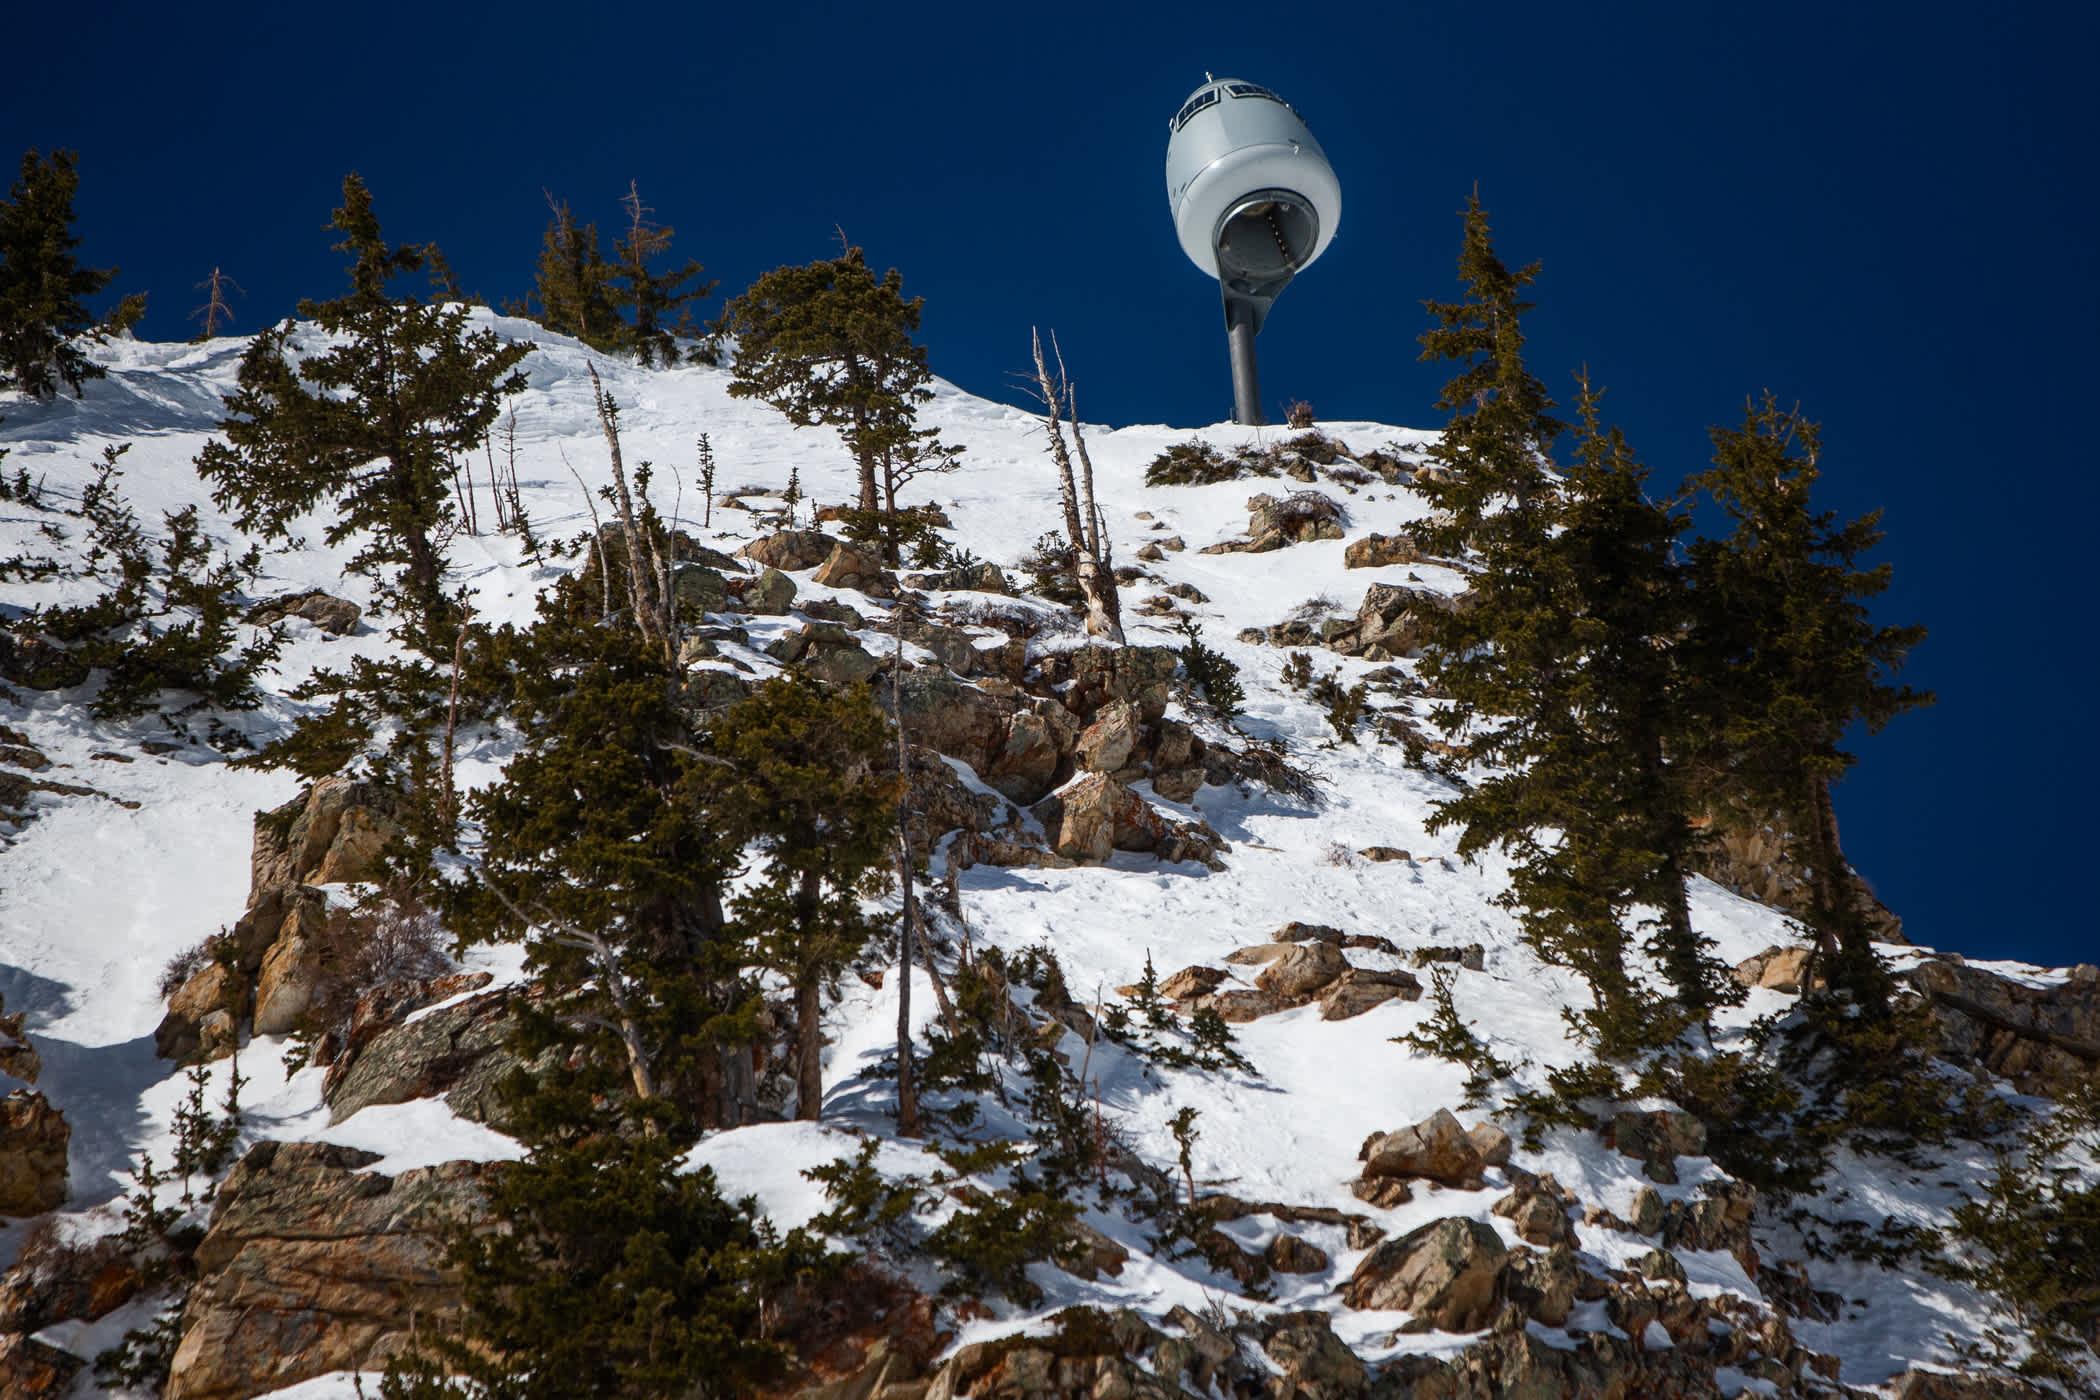 O'Bellx at Alta Ski Area